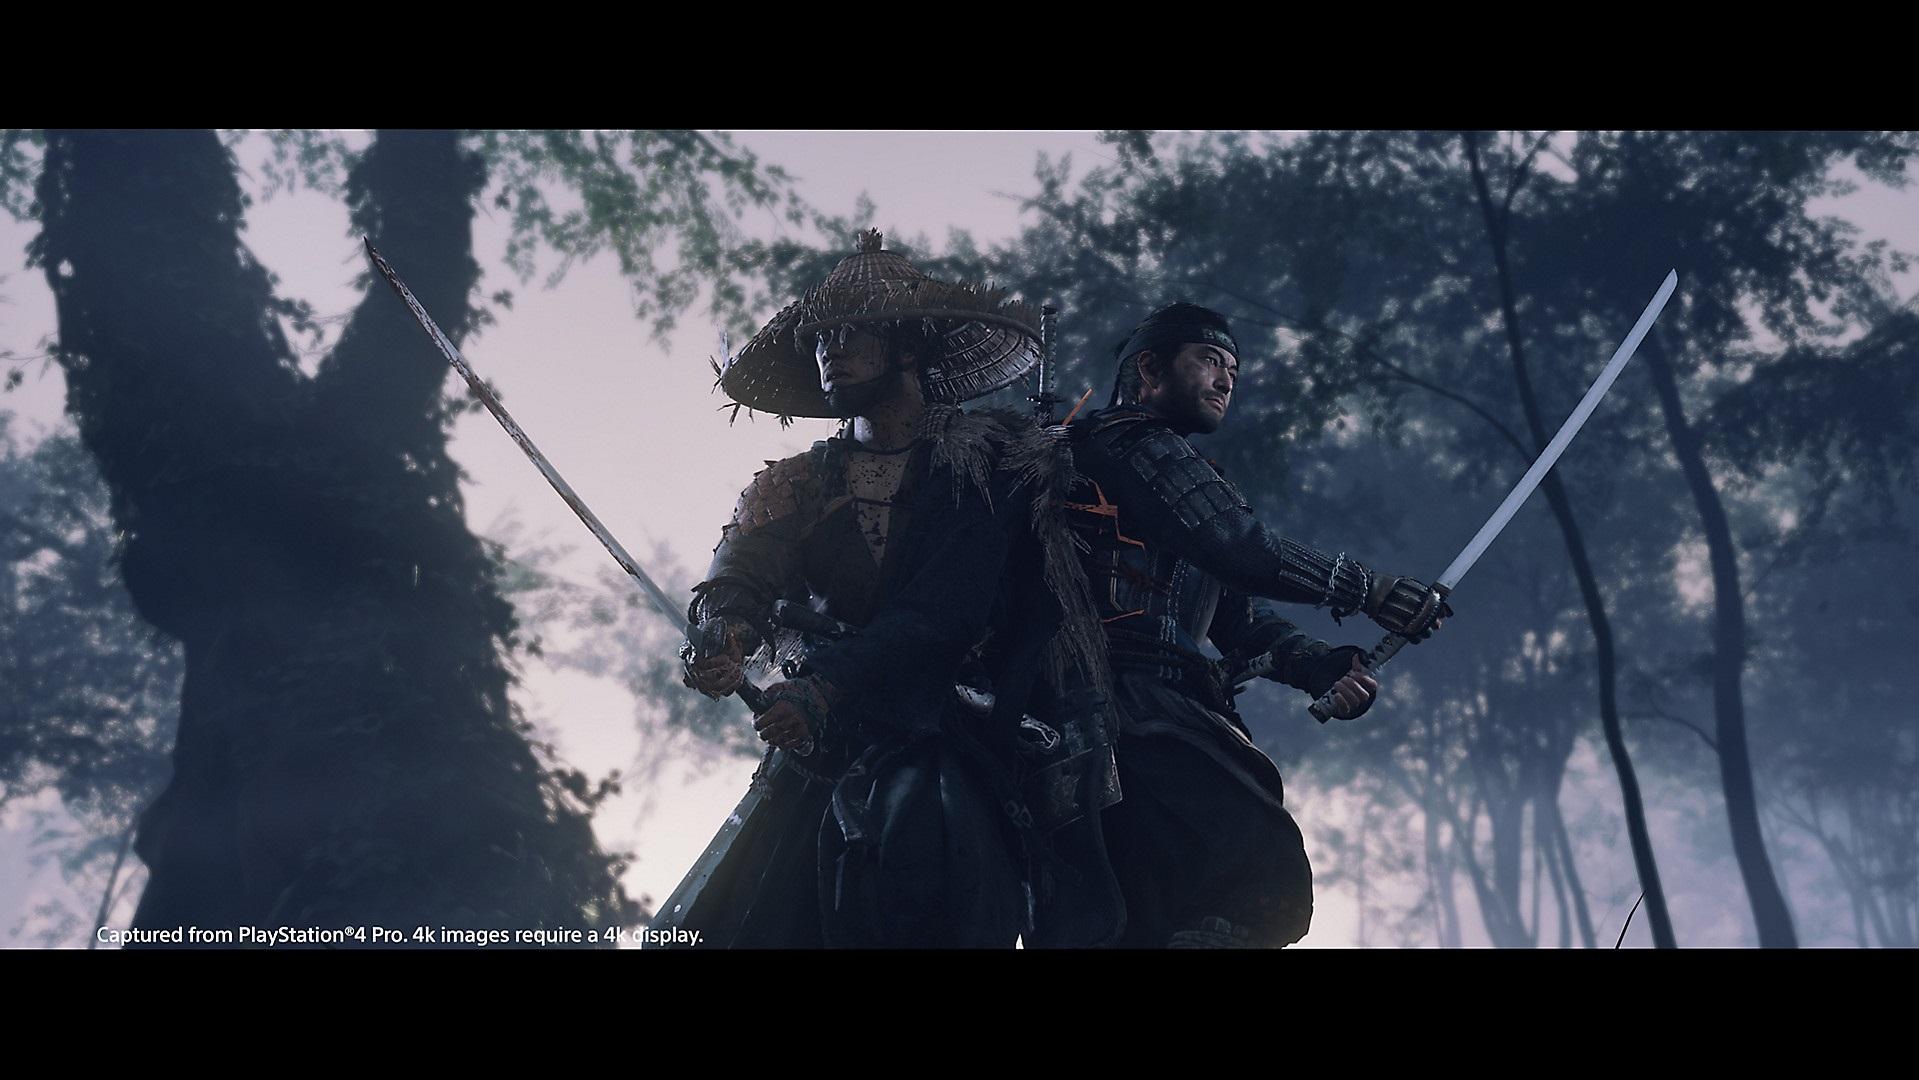 PS4《对马岛之鬼》新预告视频发布 展示主角自定